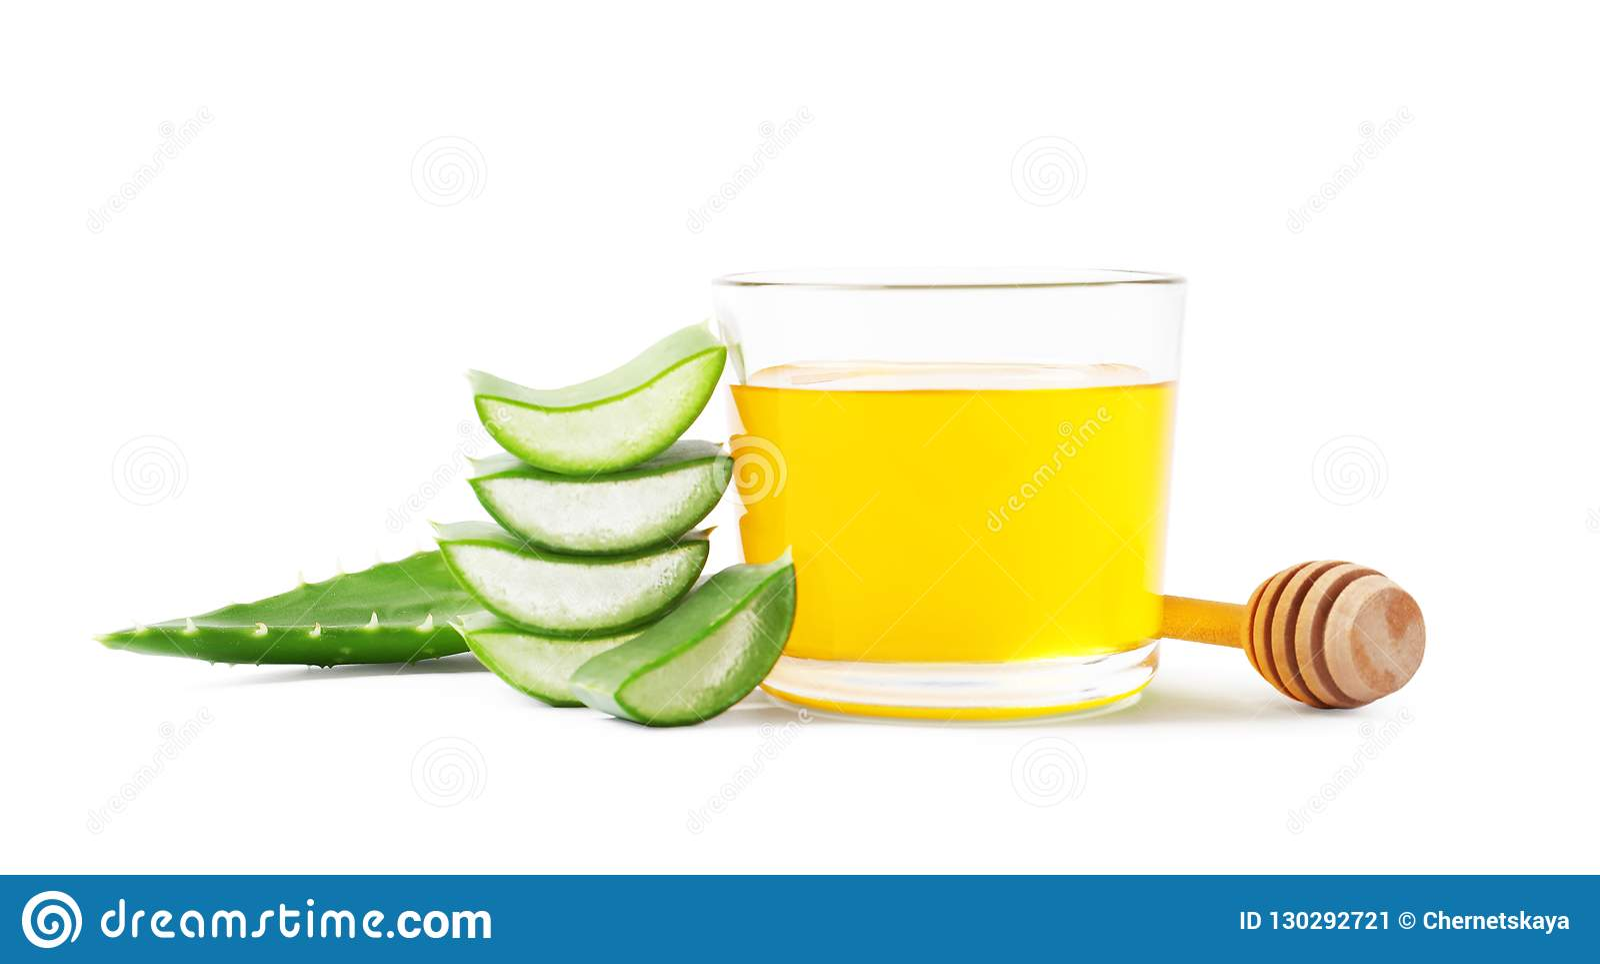 Glass of honey and aloe vera